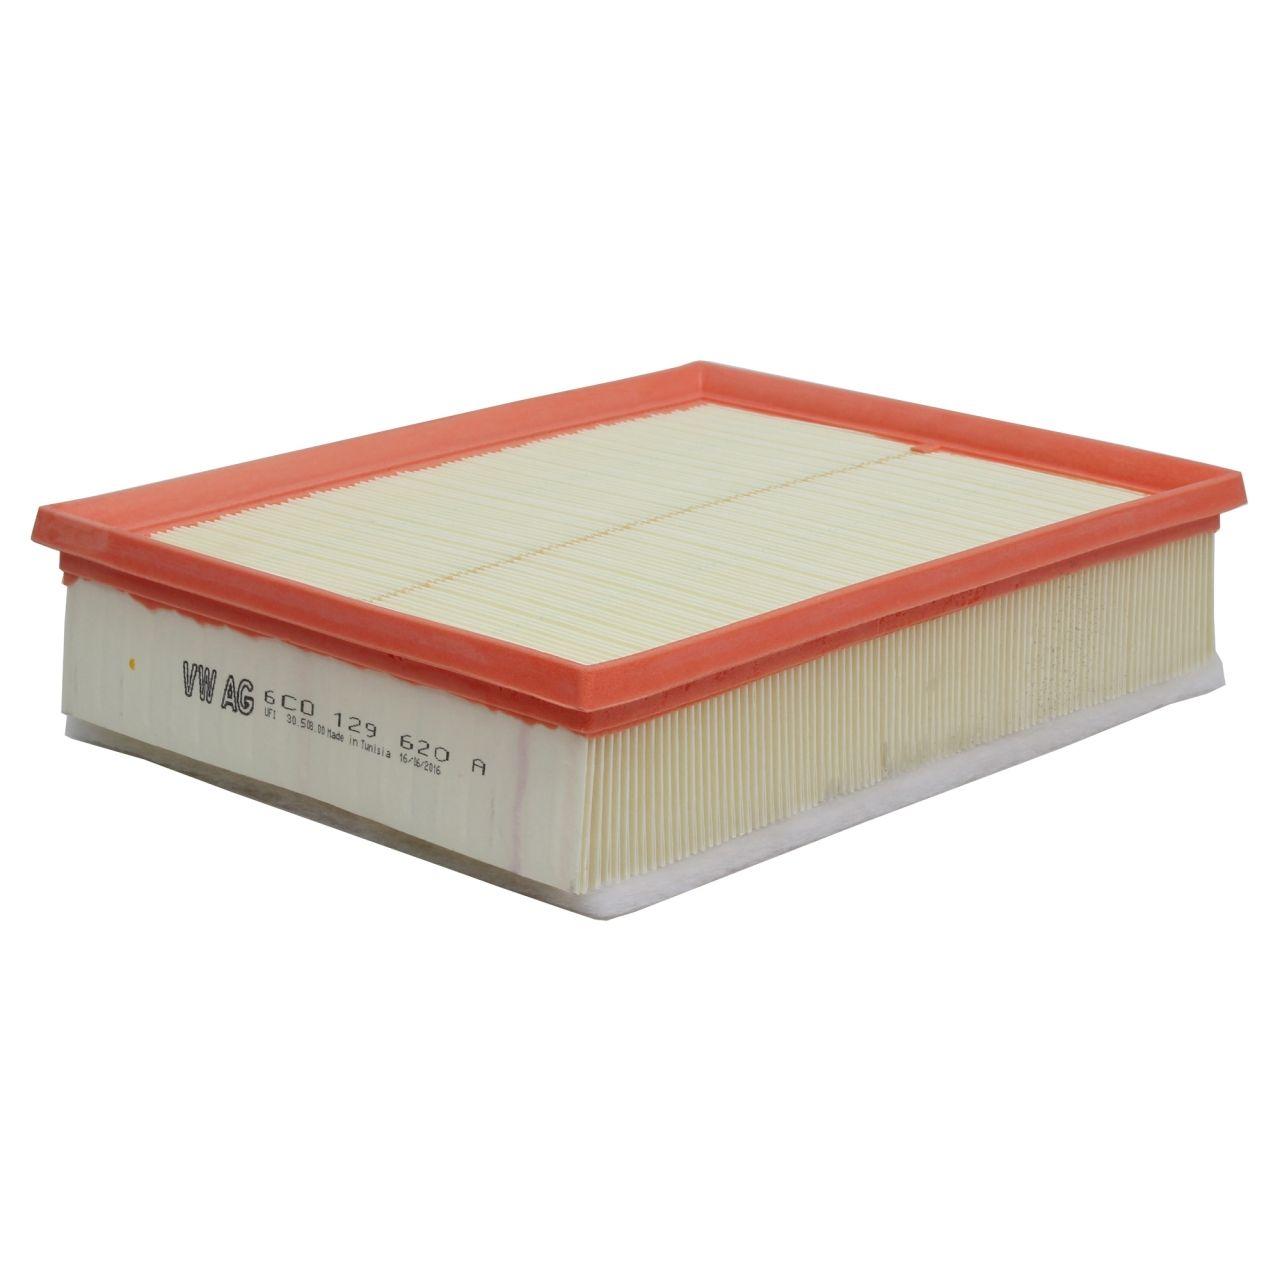 HAVA FİLTRESİ 3050800 A1 1.6TDI TOLEDO-IV 1.6 TDI RAPID (CXMA CWZA)